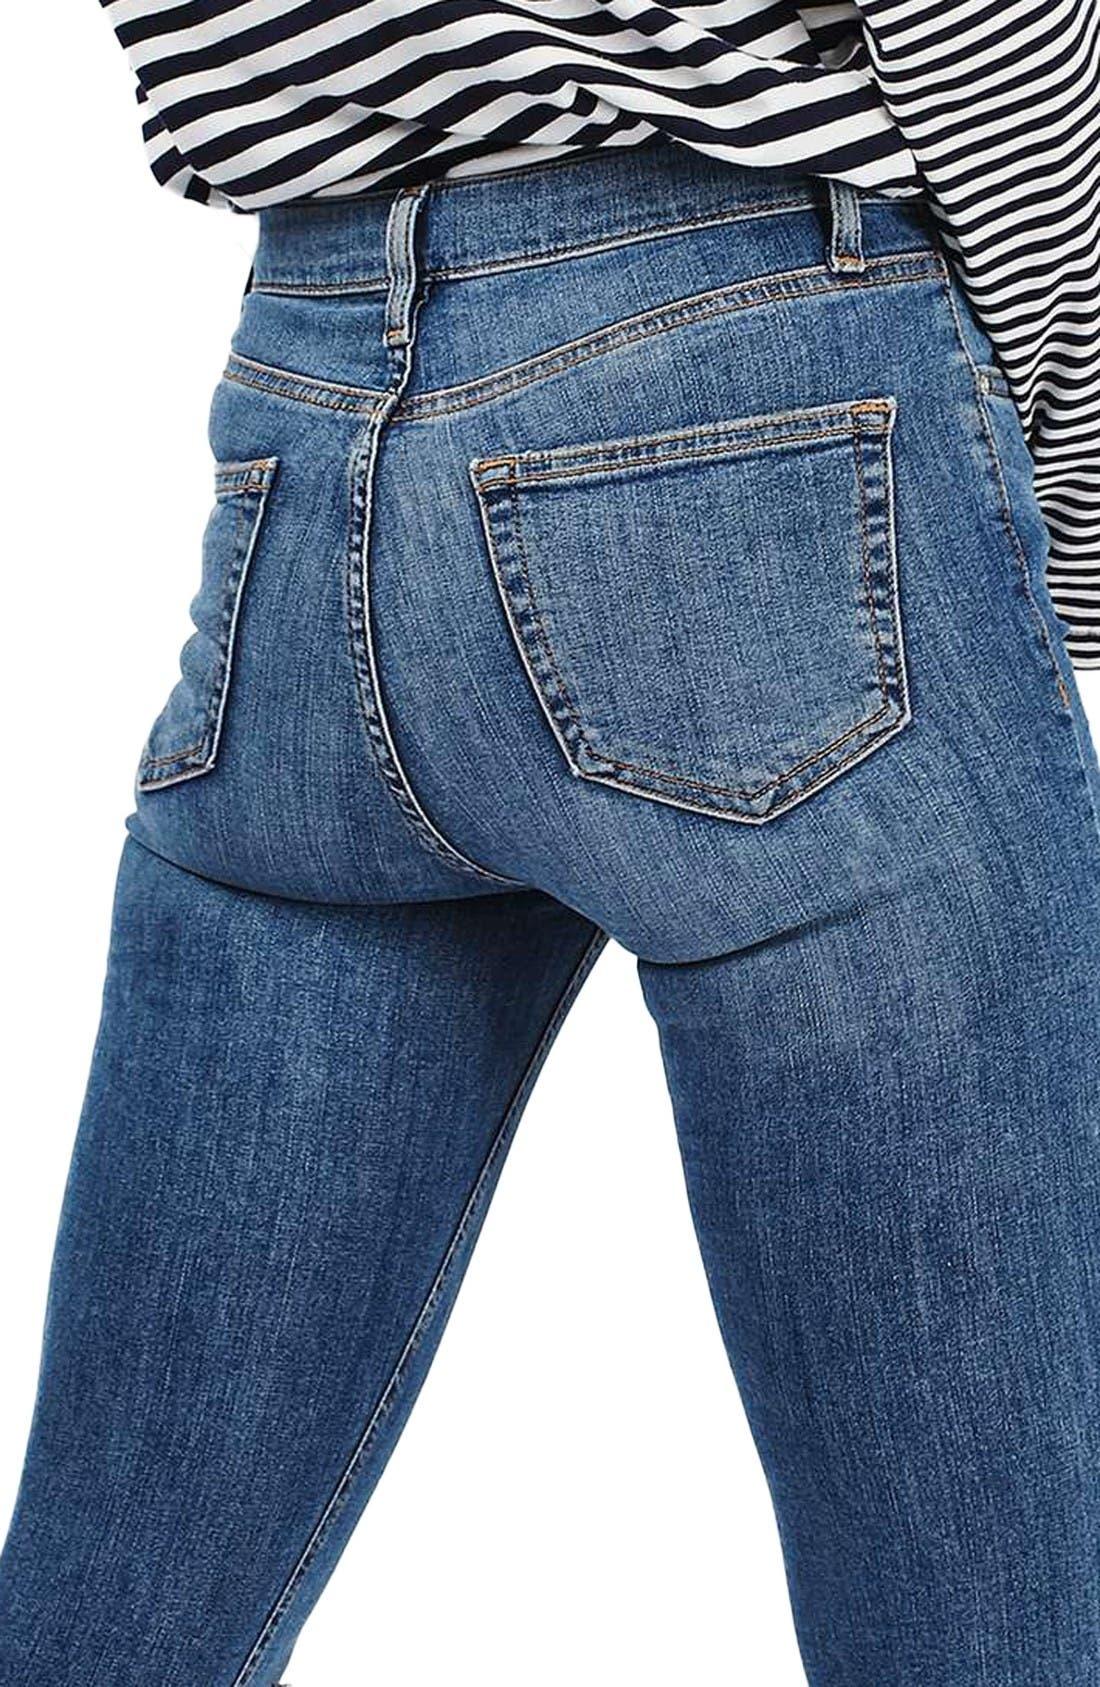 Alternate Image 3  - Topshop Moto Jamie Ripped High Waist Ankle Skinny Jeans